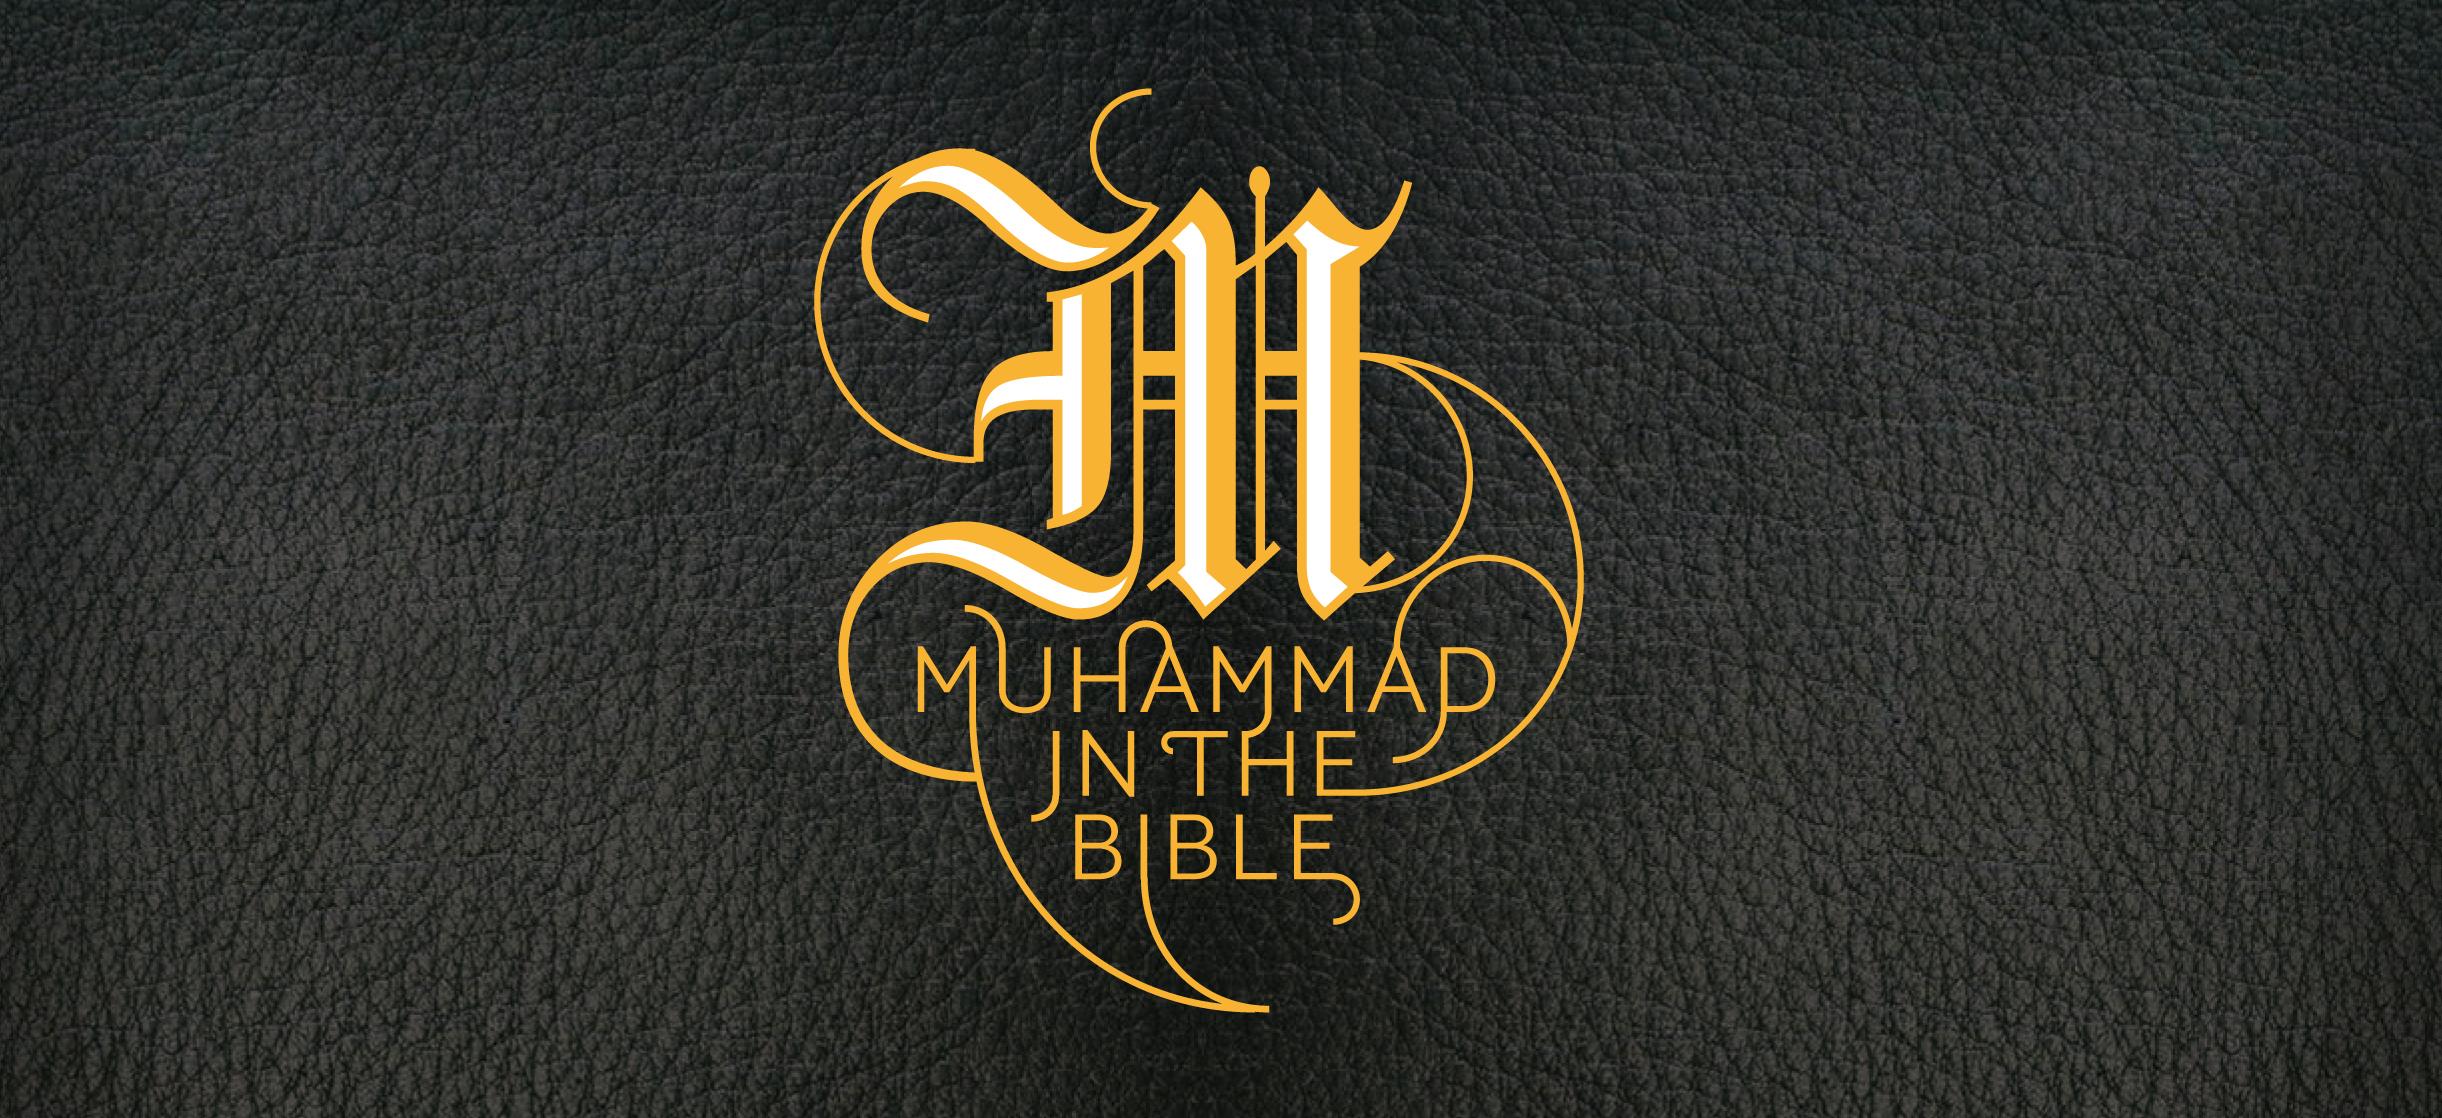 Exact Biblical Verses about Muhammad